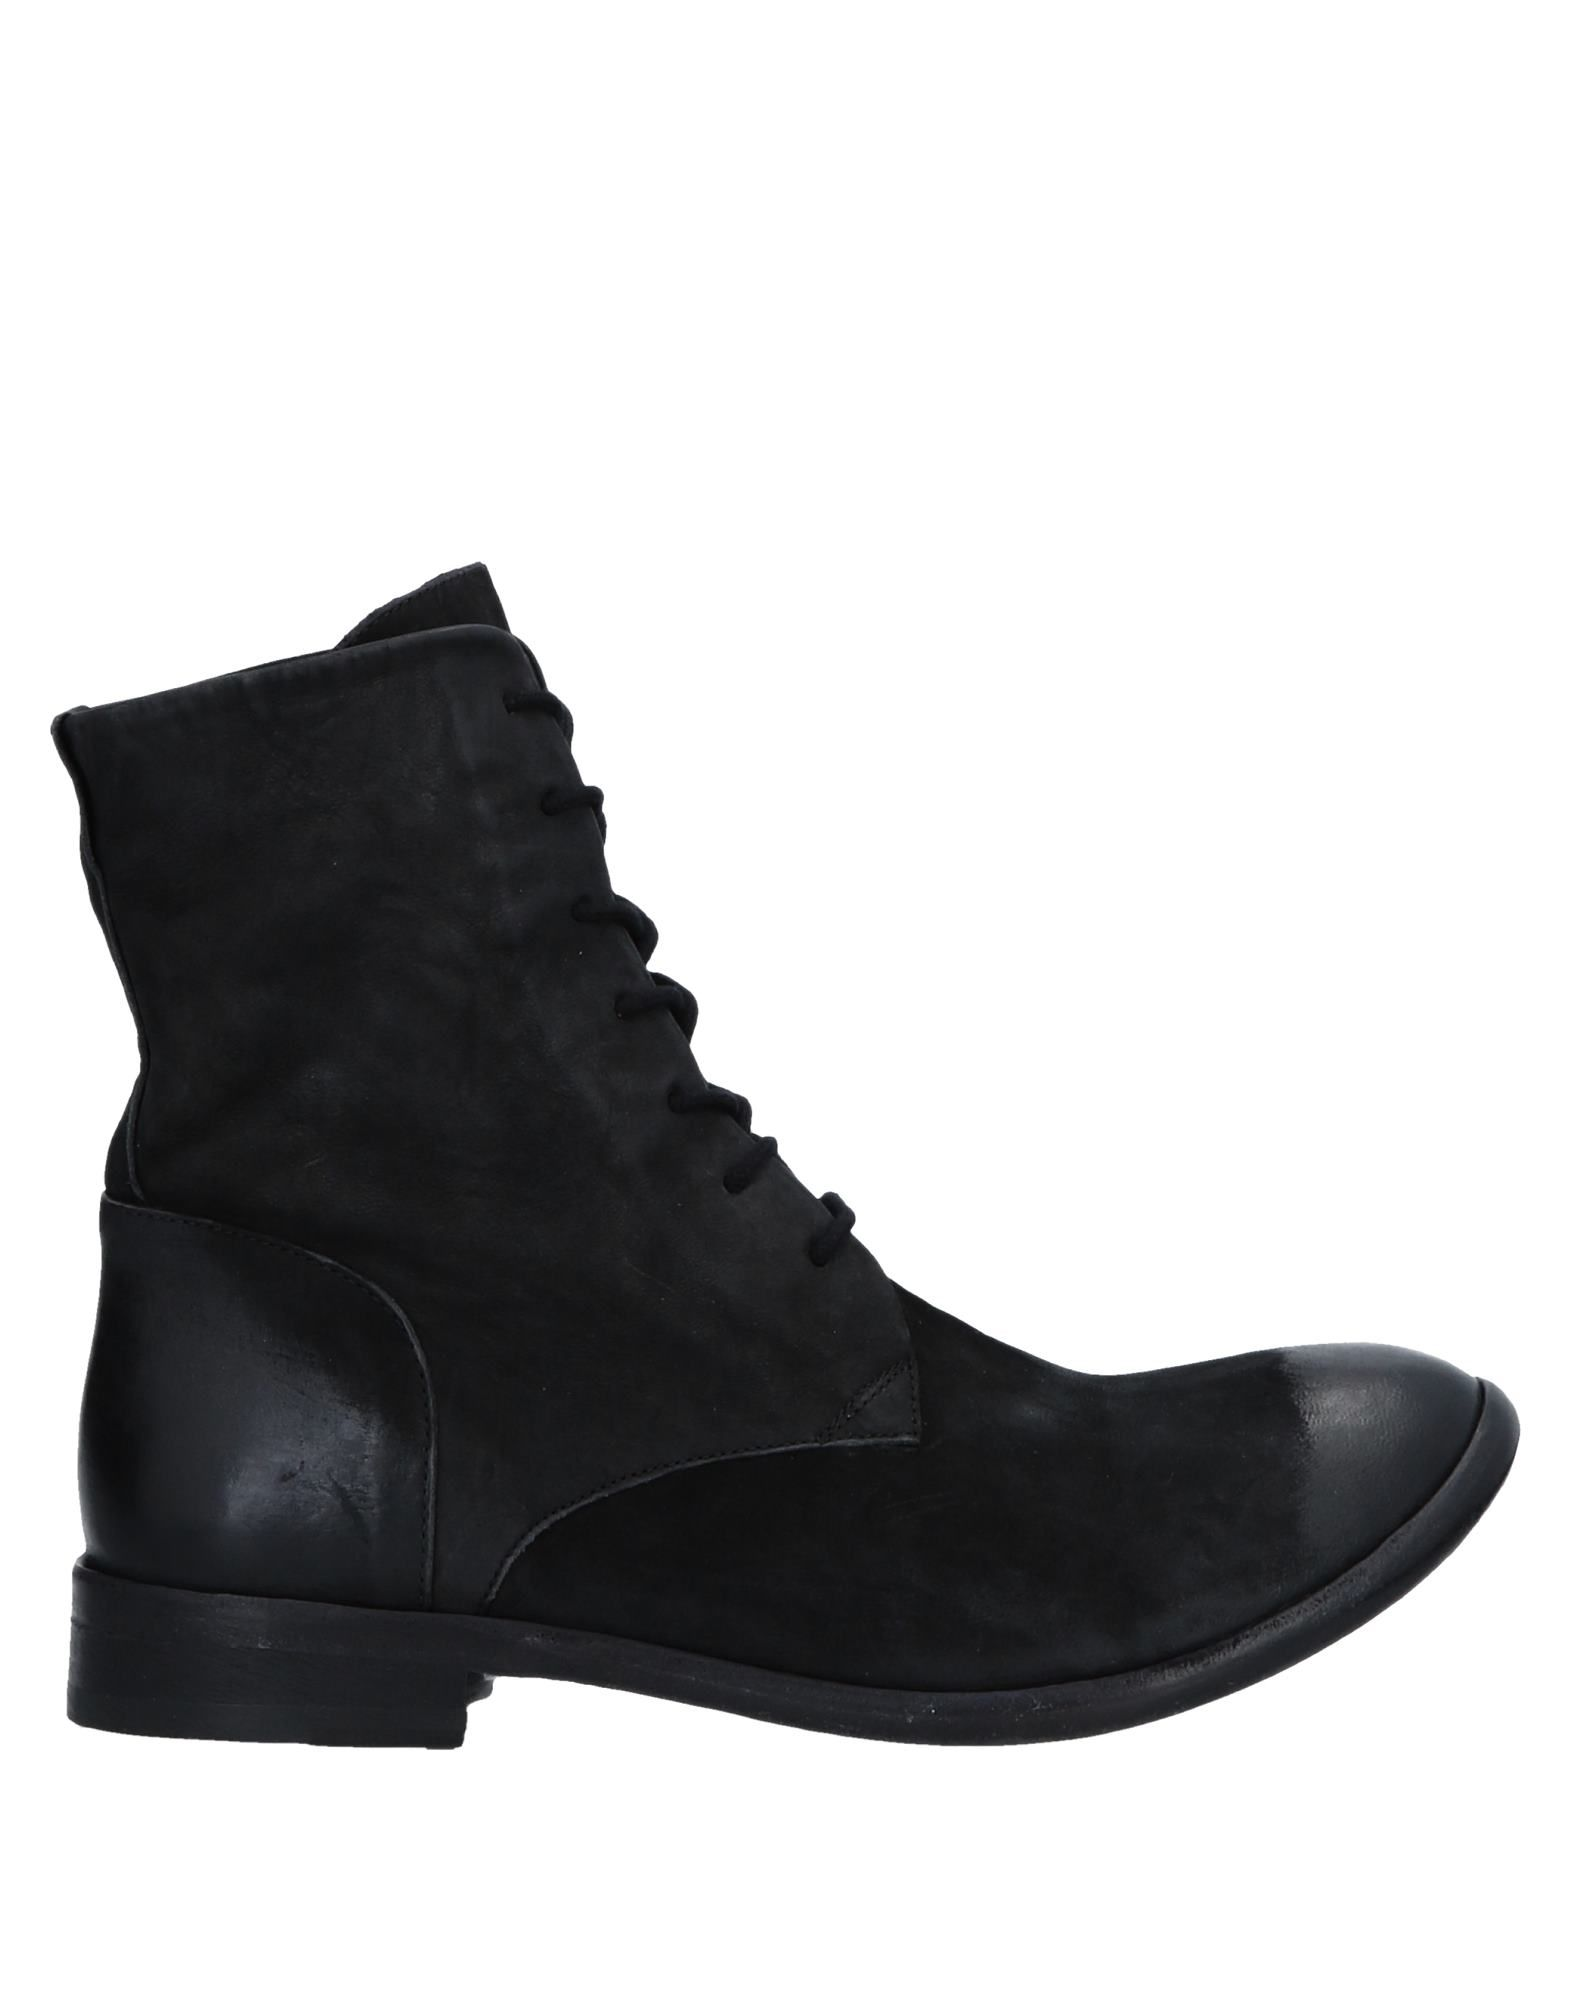 The Last Conspiracy Qualität Stiefelette Herren  11525135TL Gute Qualität Conspiracy beliebte Schuhe 860fa5